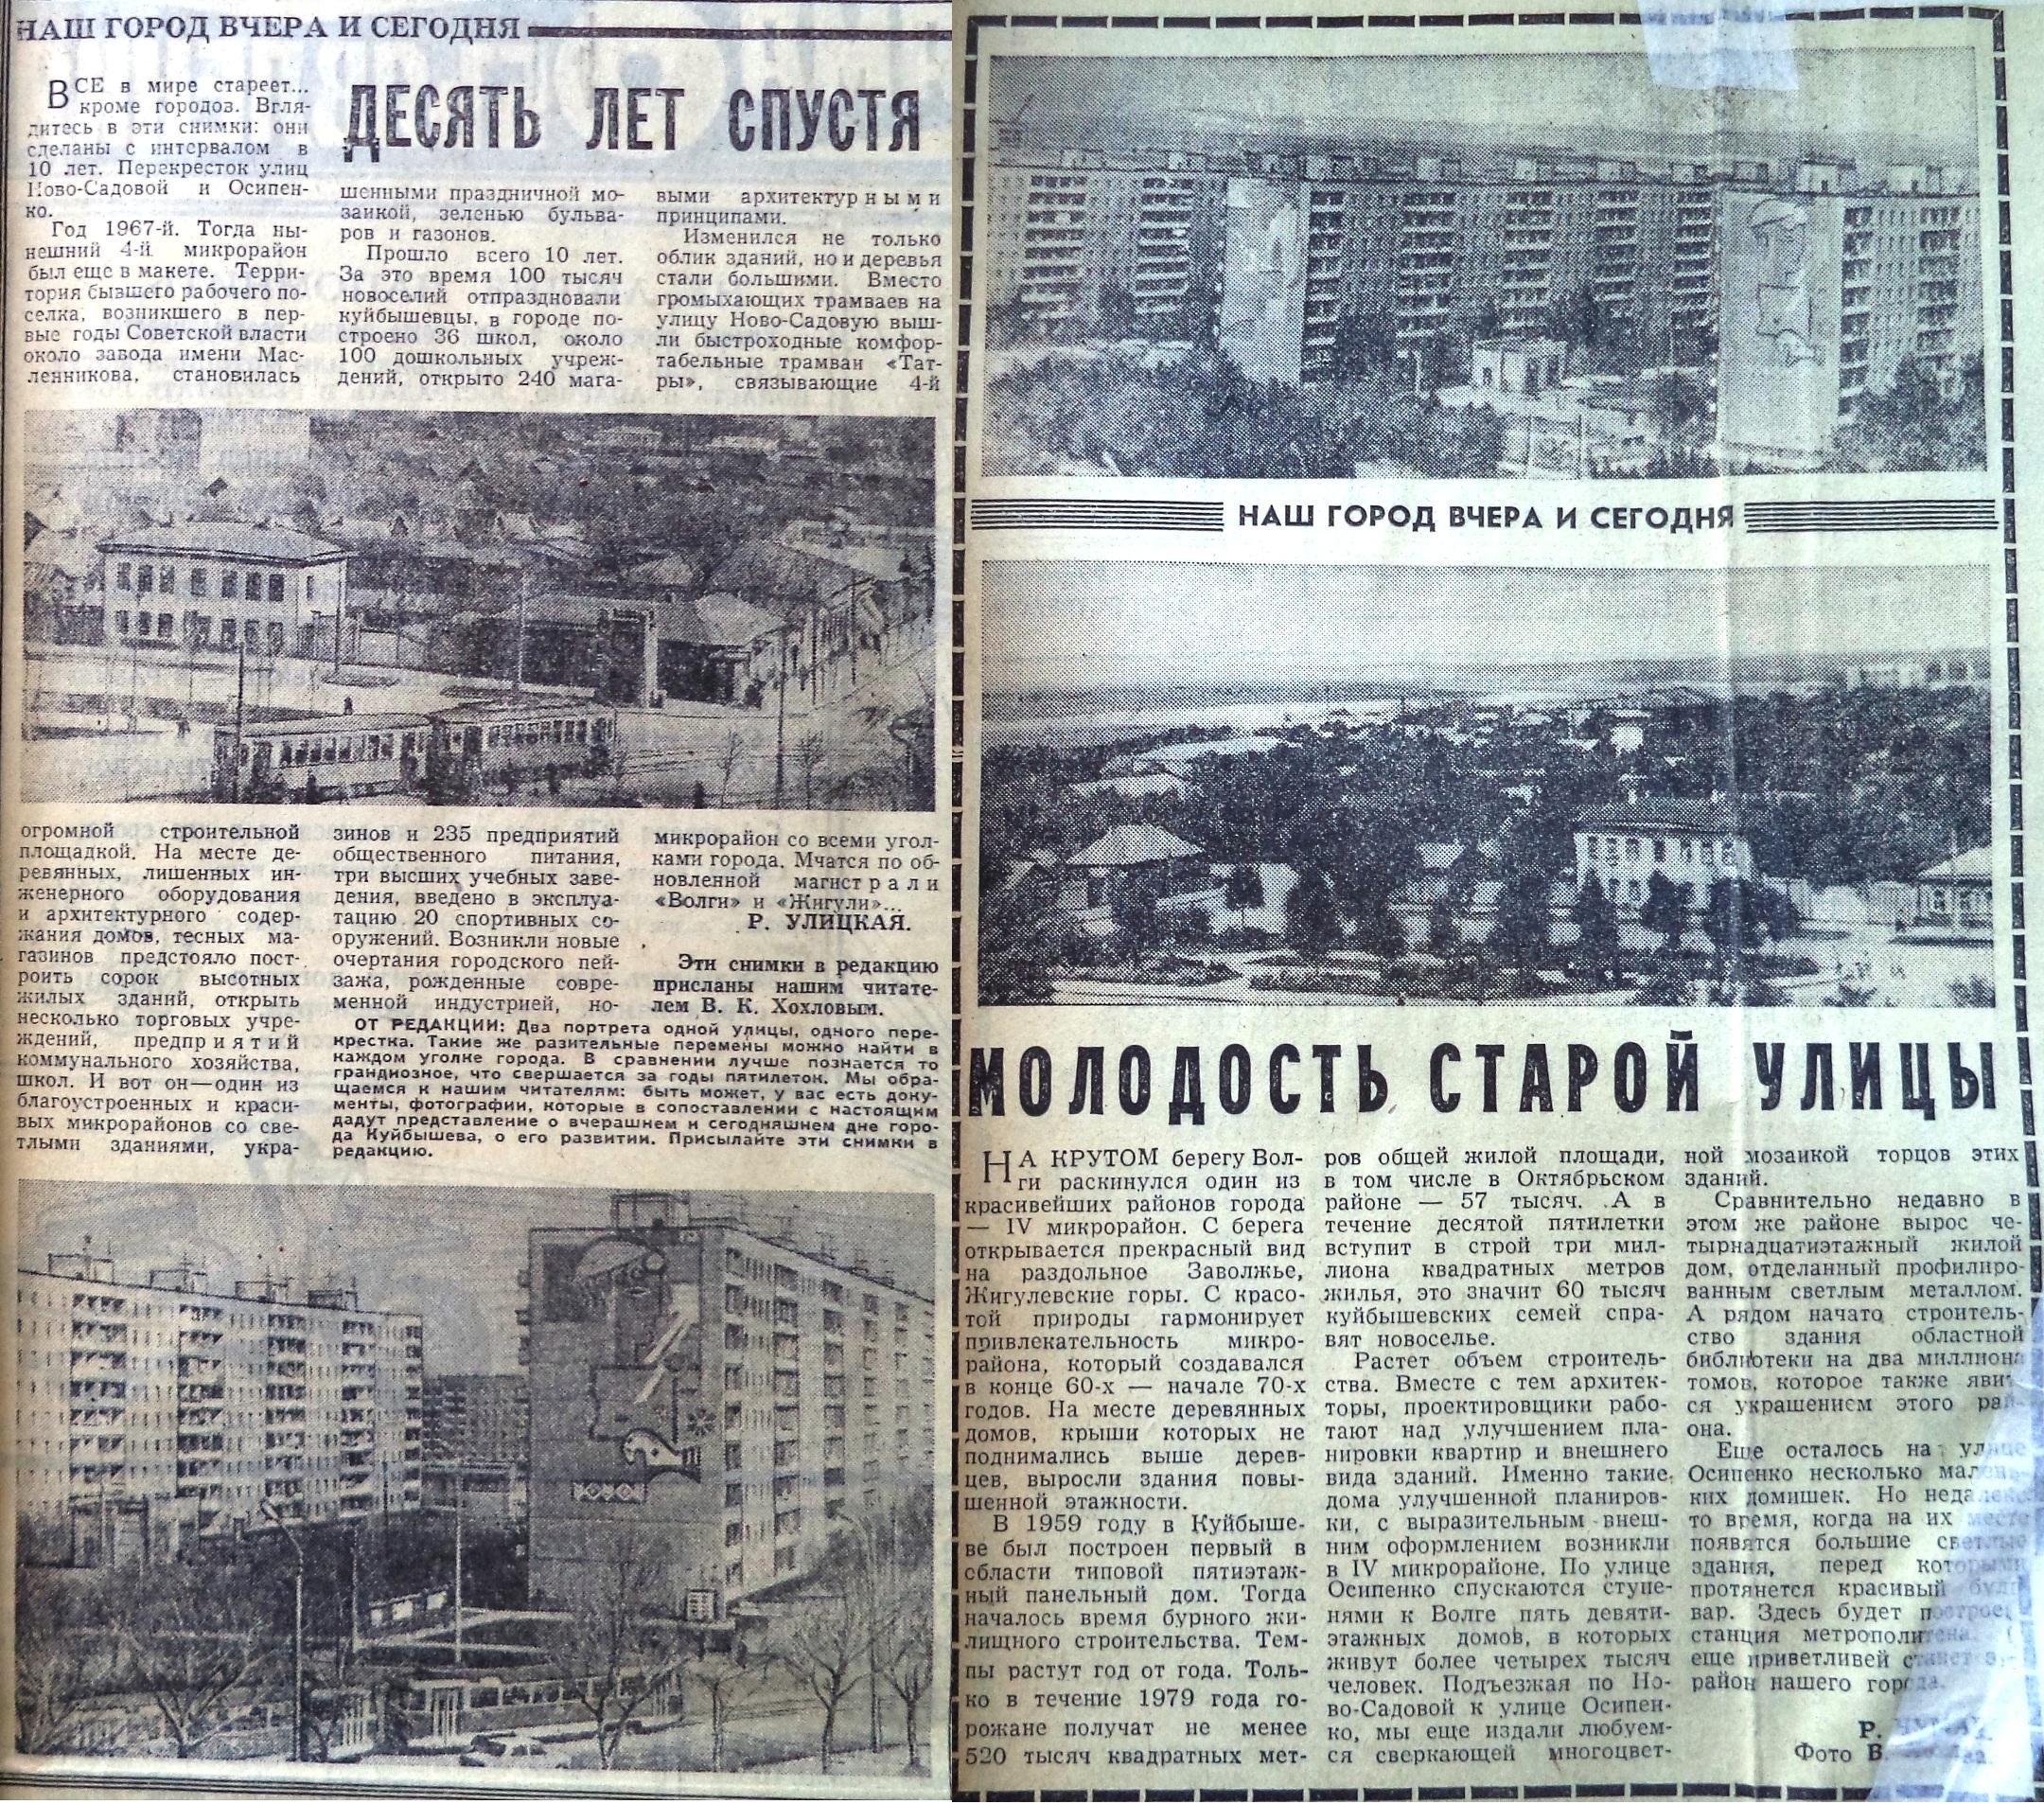 Волжская Заря. 1978 и 1979 годы